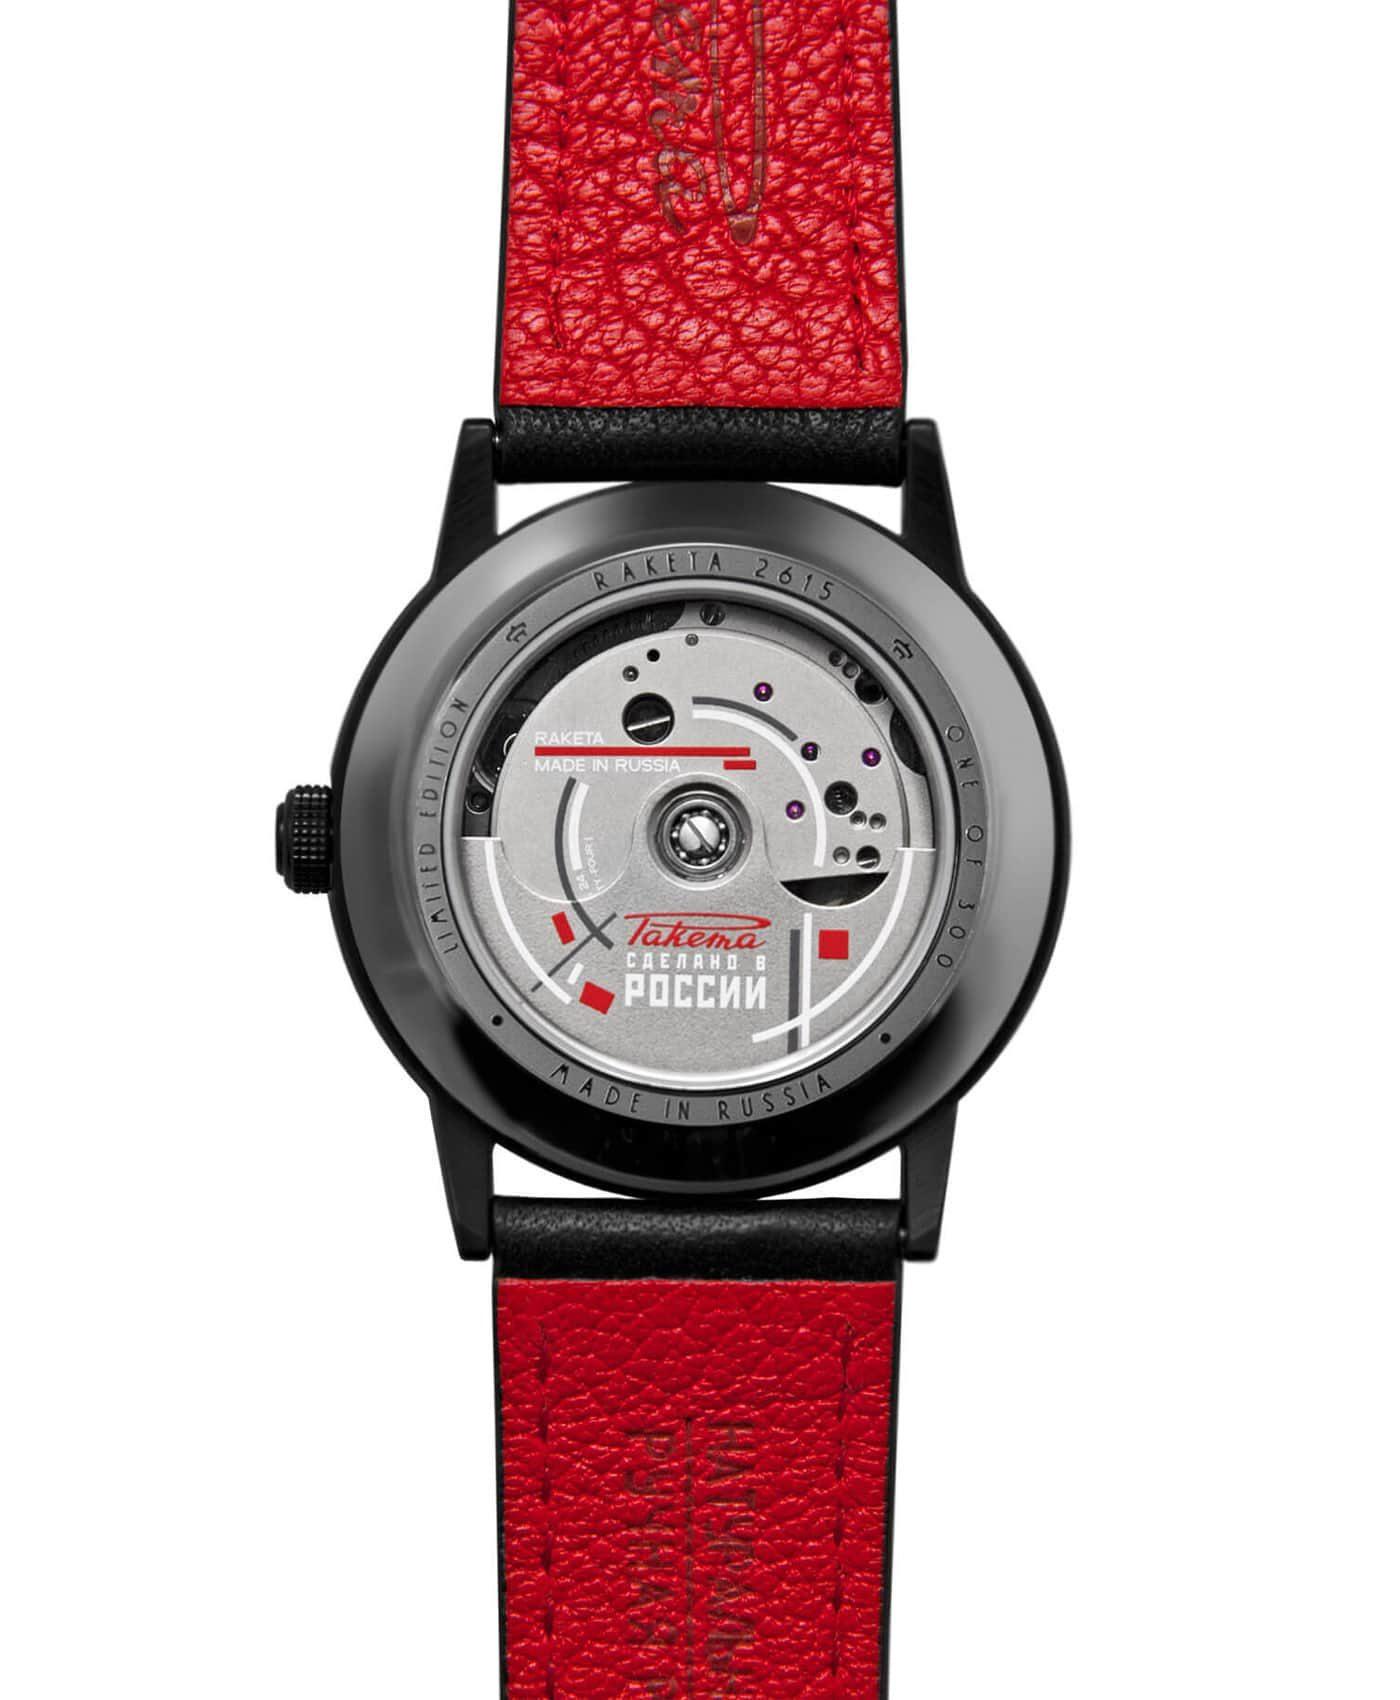 "RAKETA ""AVANT-GARDE"" 0279 watch movement case back-min"